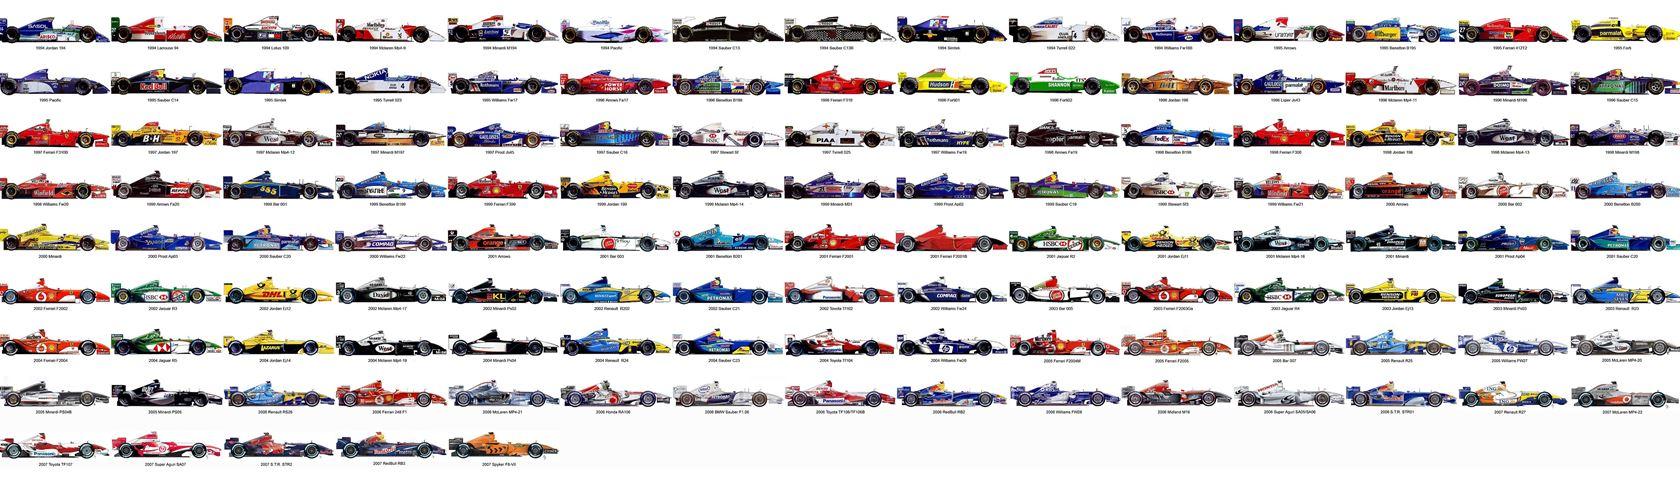 Formula 1 Cars: 1994 to 2007